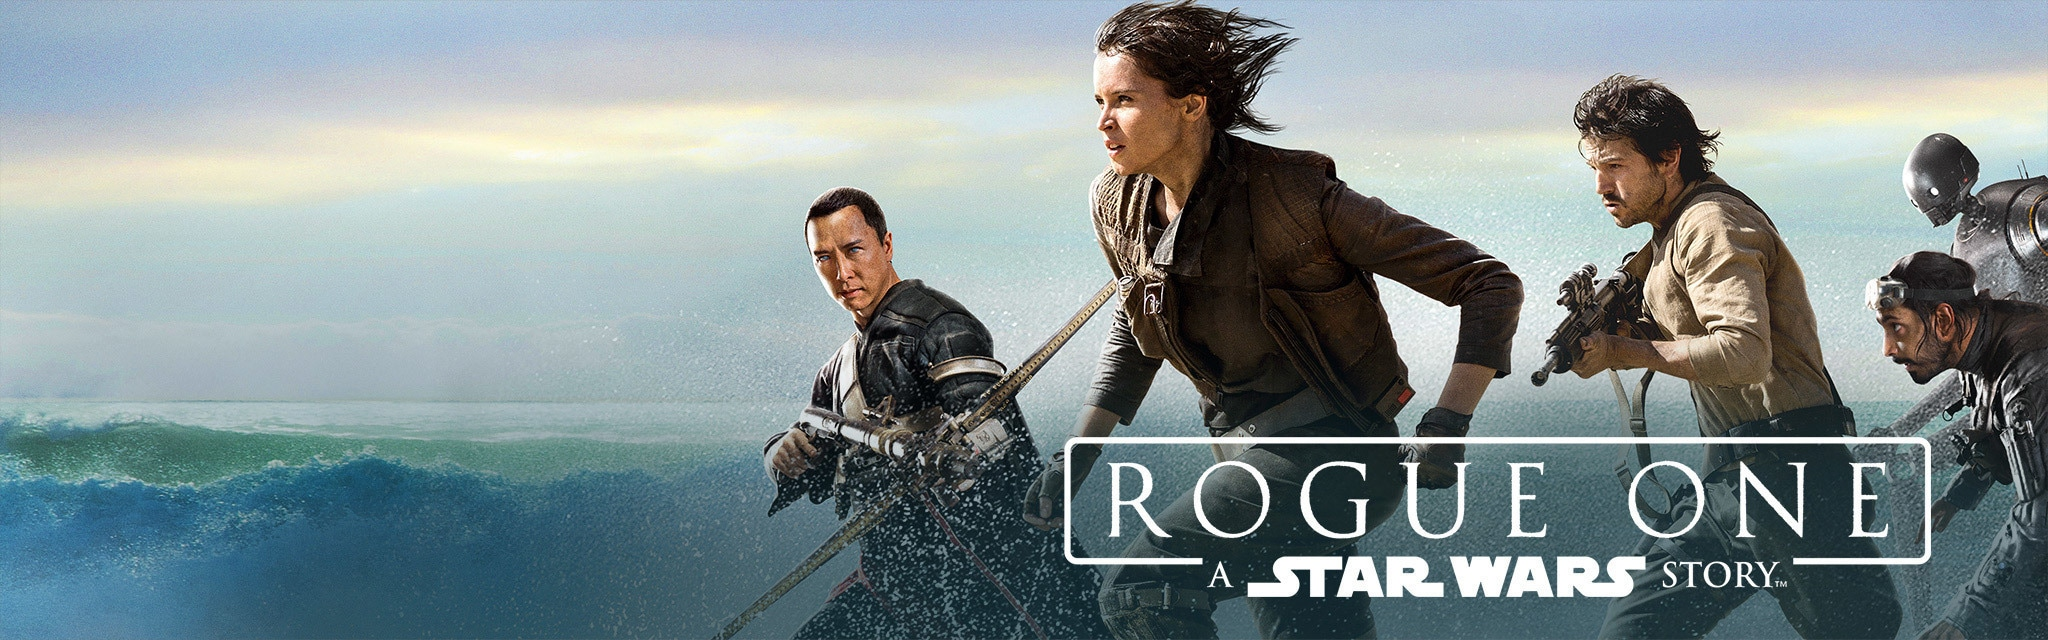 Rogue One avr17 (hero promo)